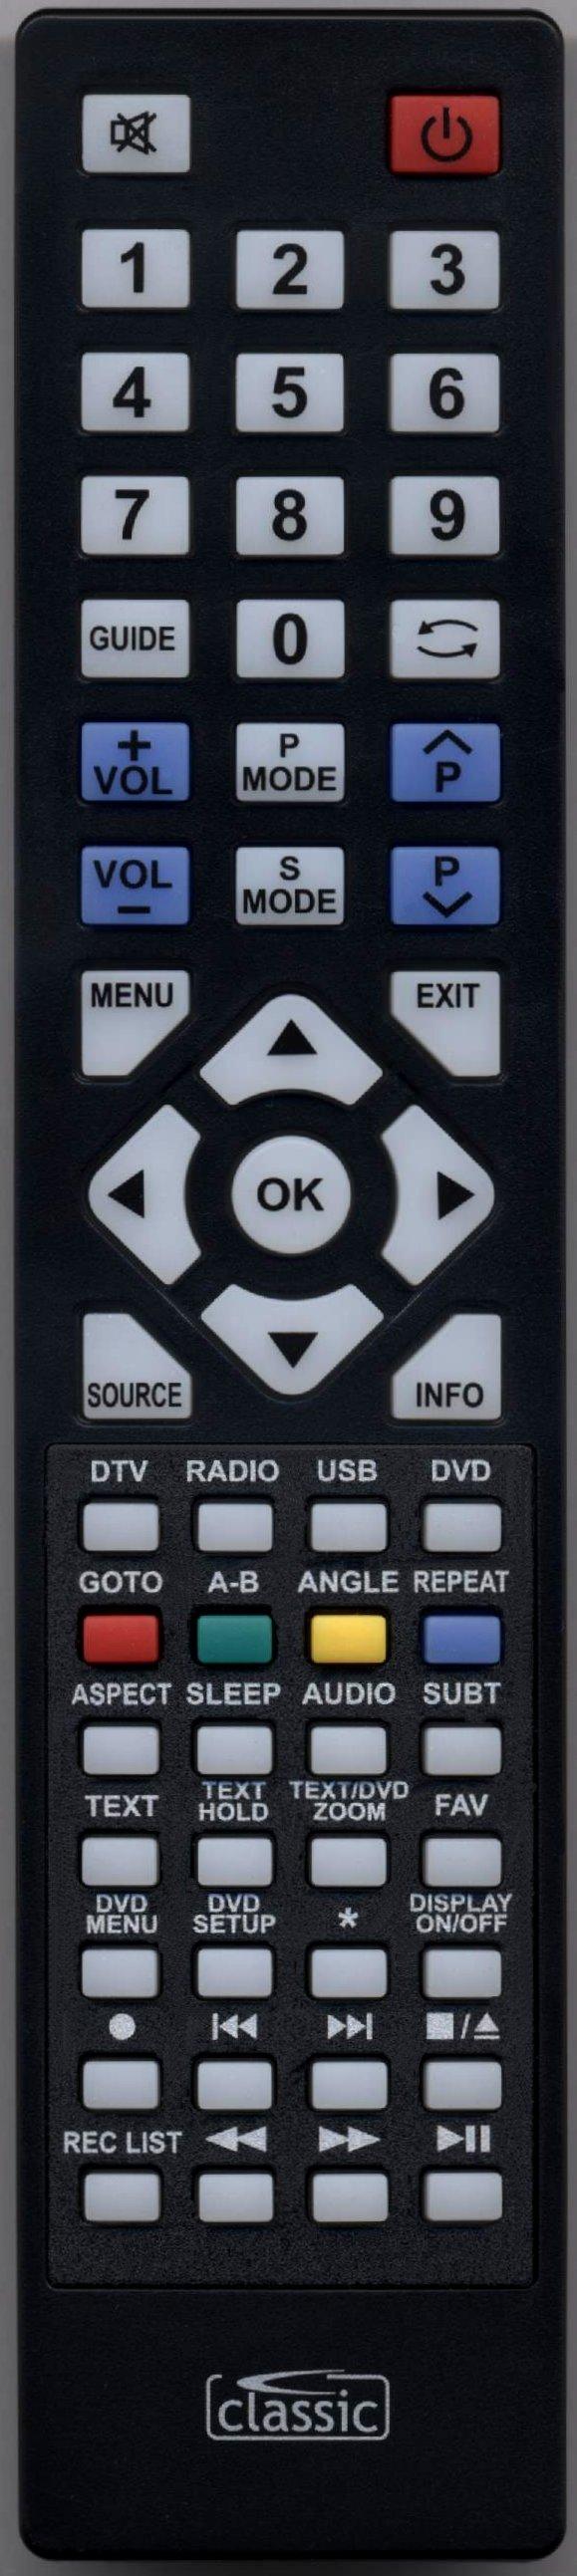 BLAUPUNKT 32/147I-GB-5B-HBKUP-UK Remote Control Alternative